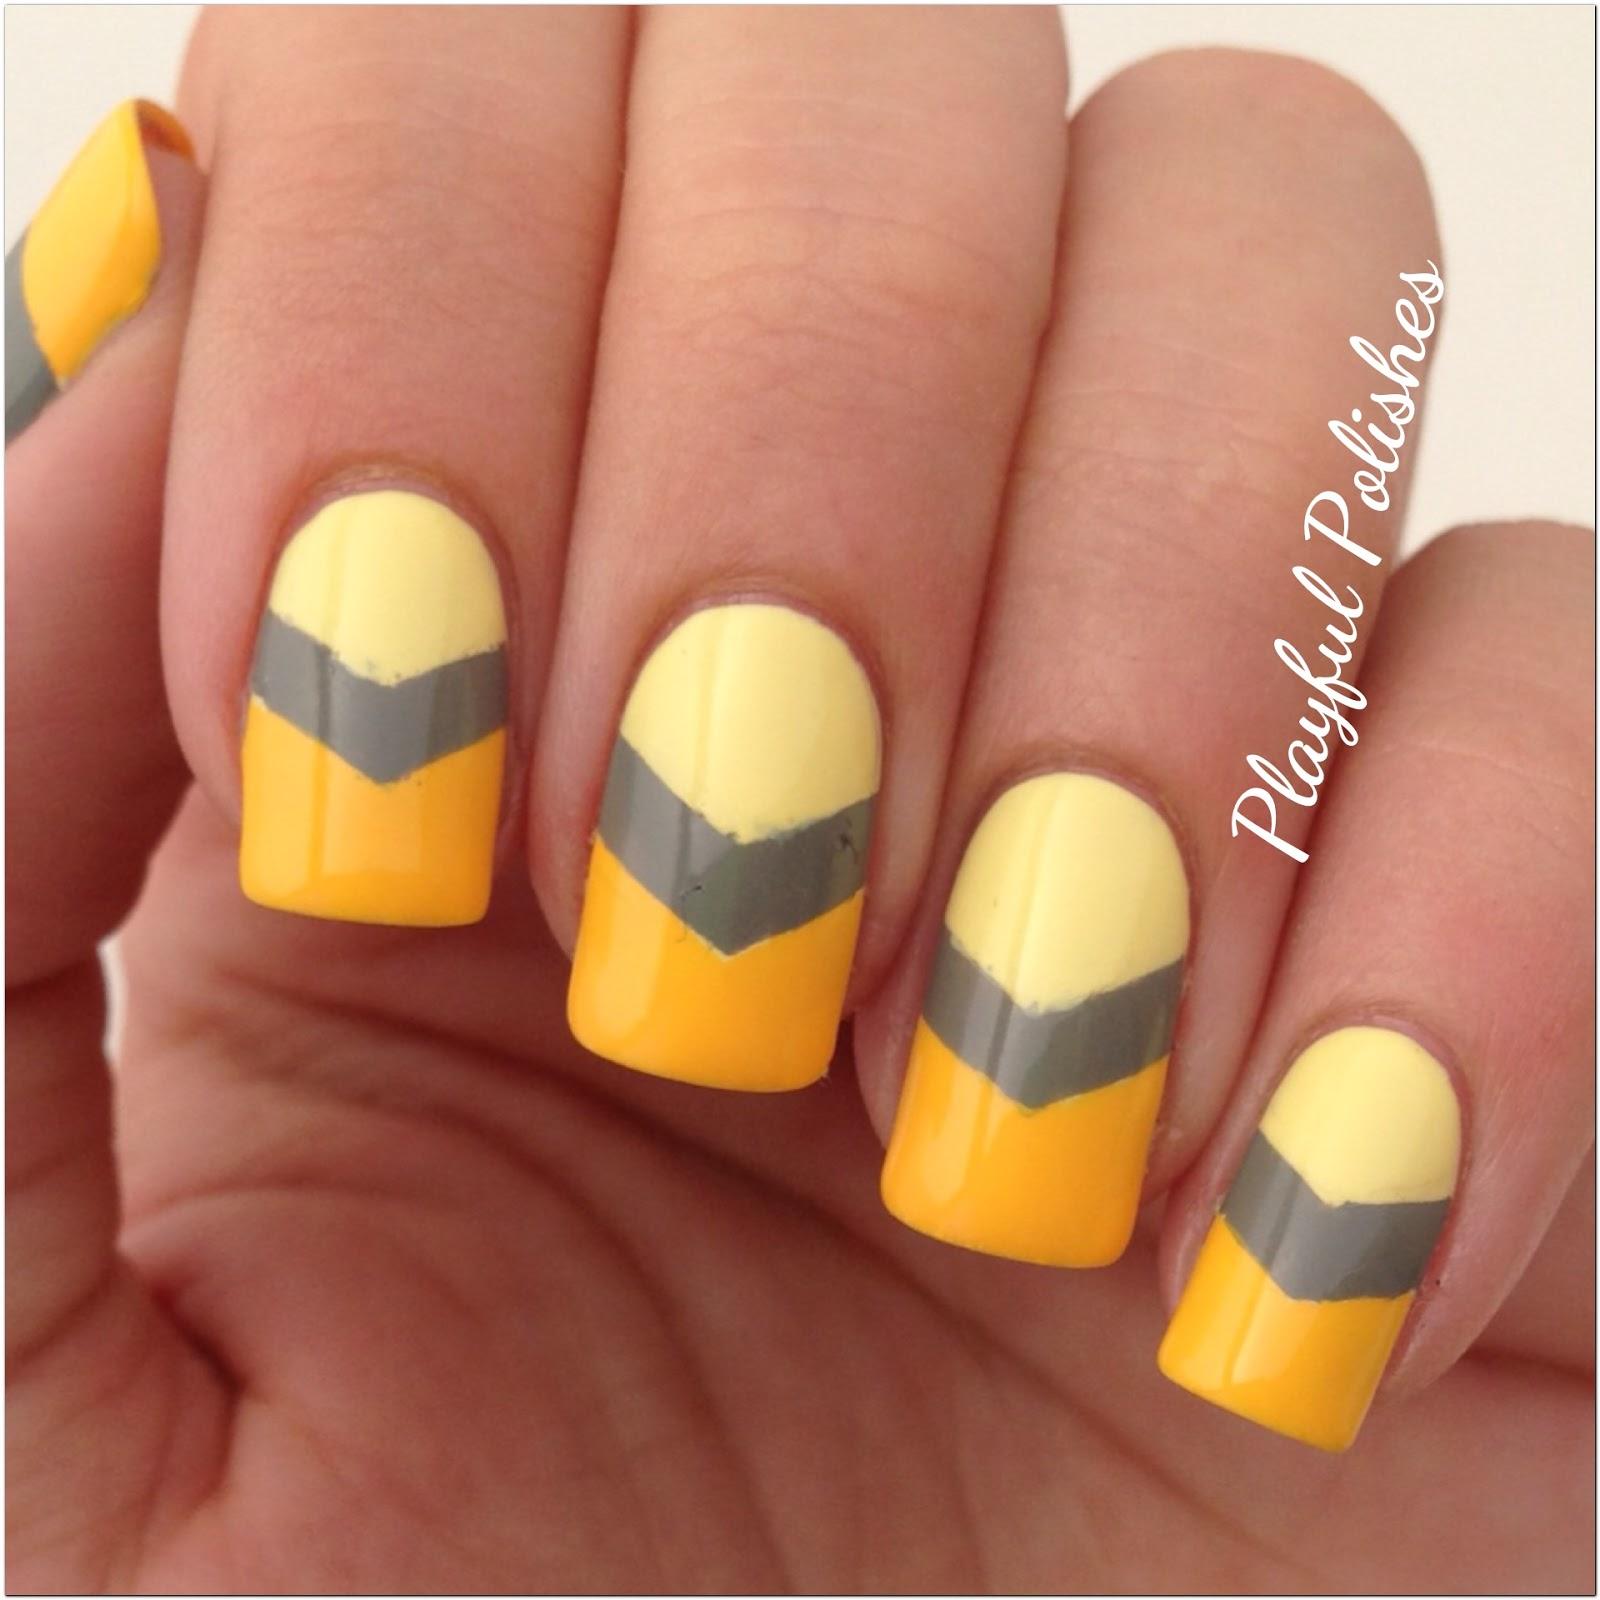 Yellow Nail Polish On: Playful Polishes: 31 DAY NAIL ART CHALLENGE: YELLOW NAILS